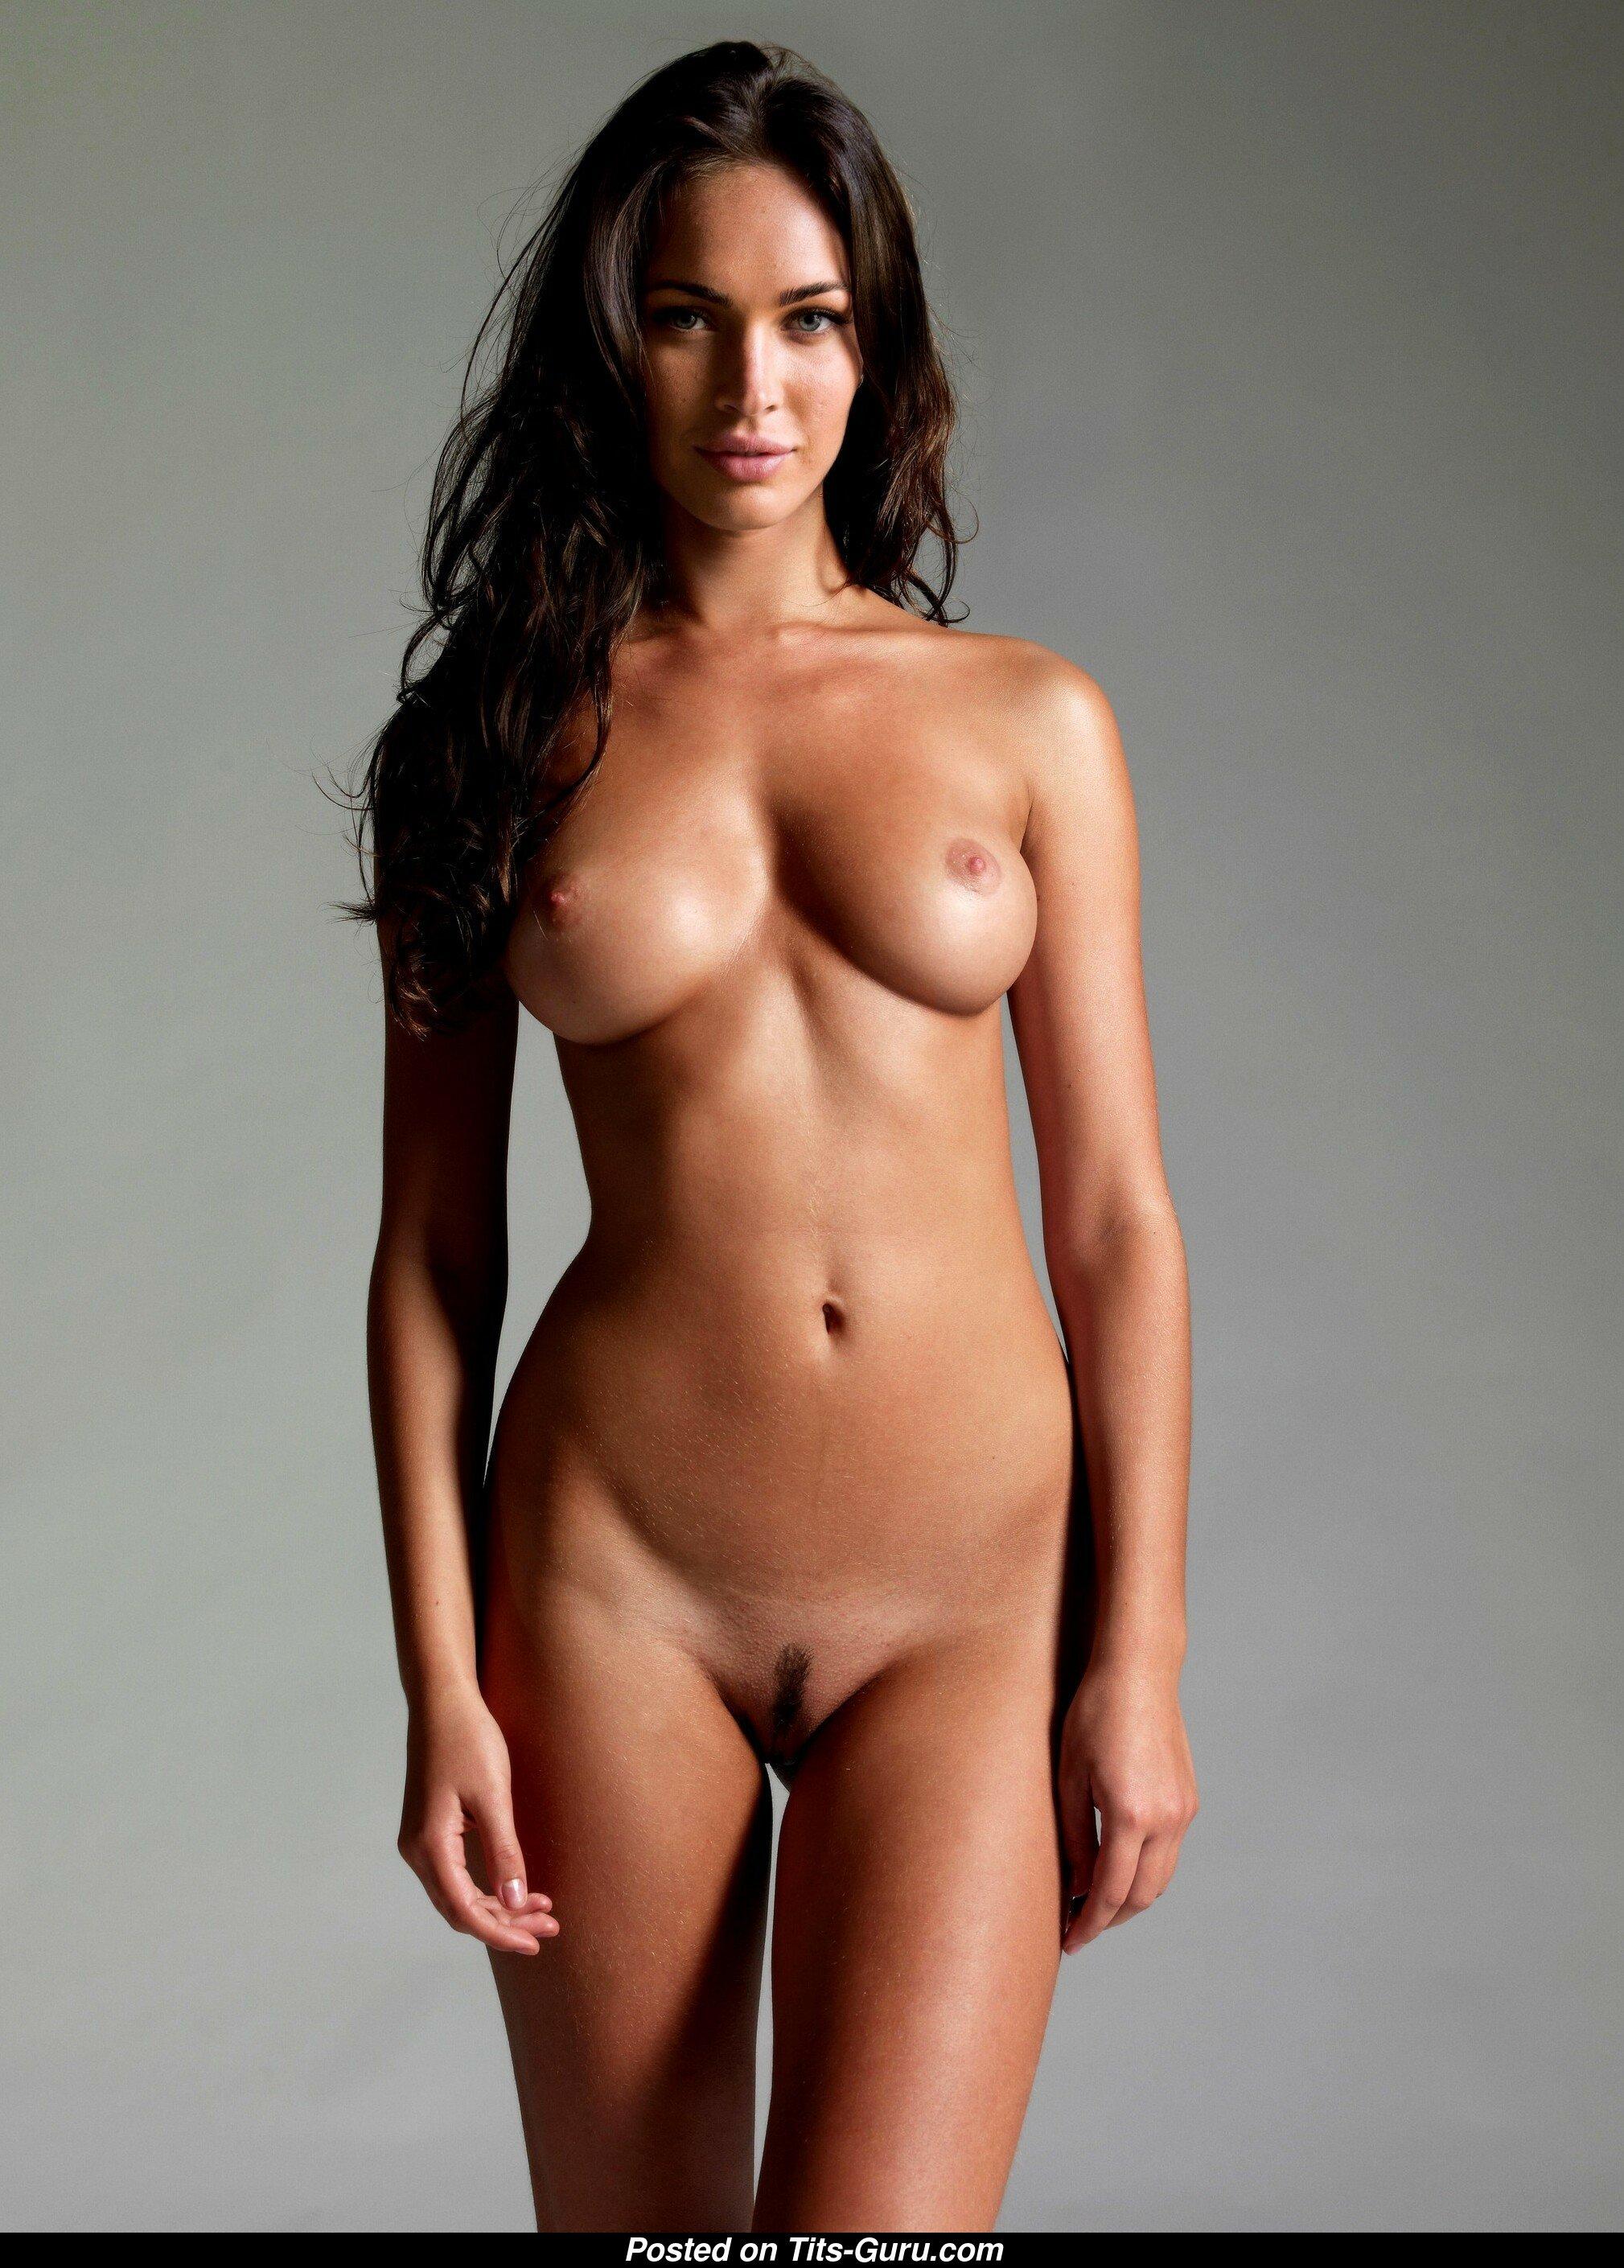 Fox nackt bilder megan Megan Fox